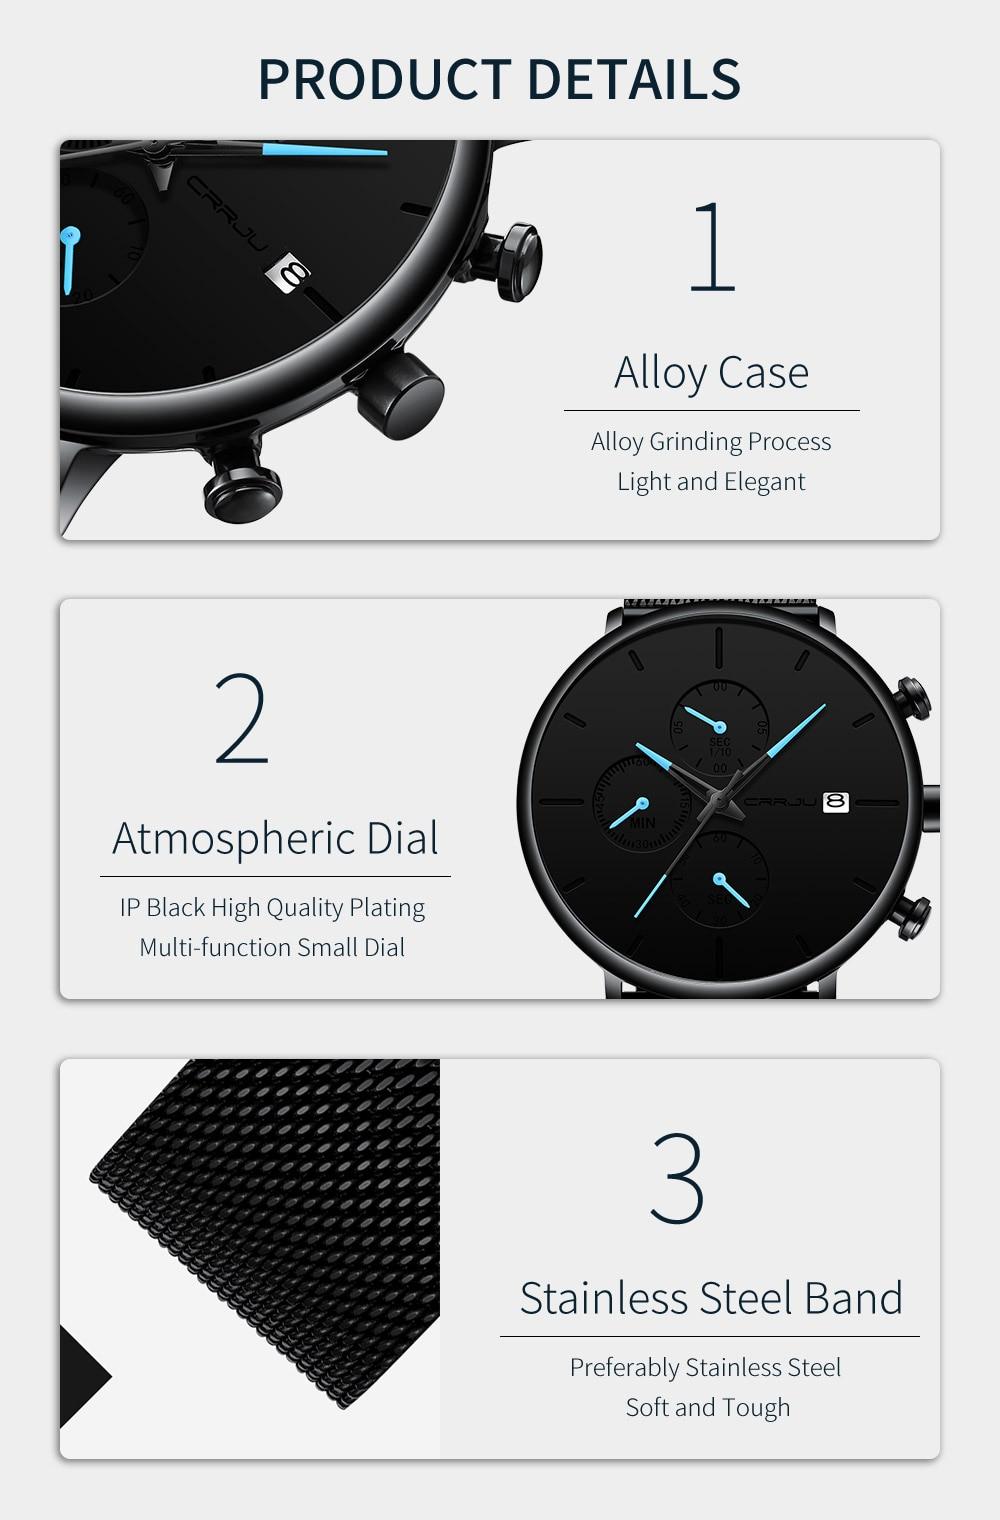 HTB1f2siVpzqK1RjSZFvq6AB7VXae Mens Women StopWatches CRRJU Unique Design Luxury Sport Wrist Watch Stainless Steel Mesh Strap Men's Fashion Casual Date Watches